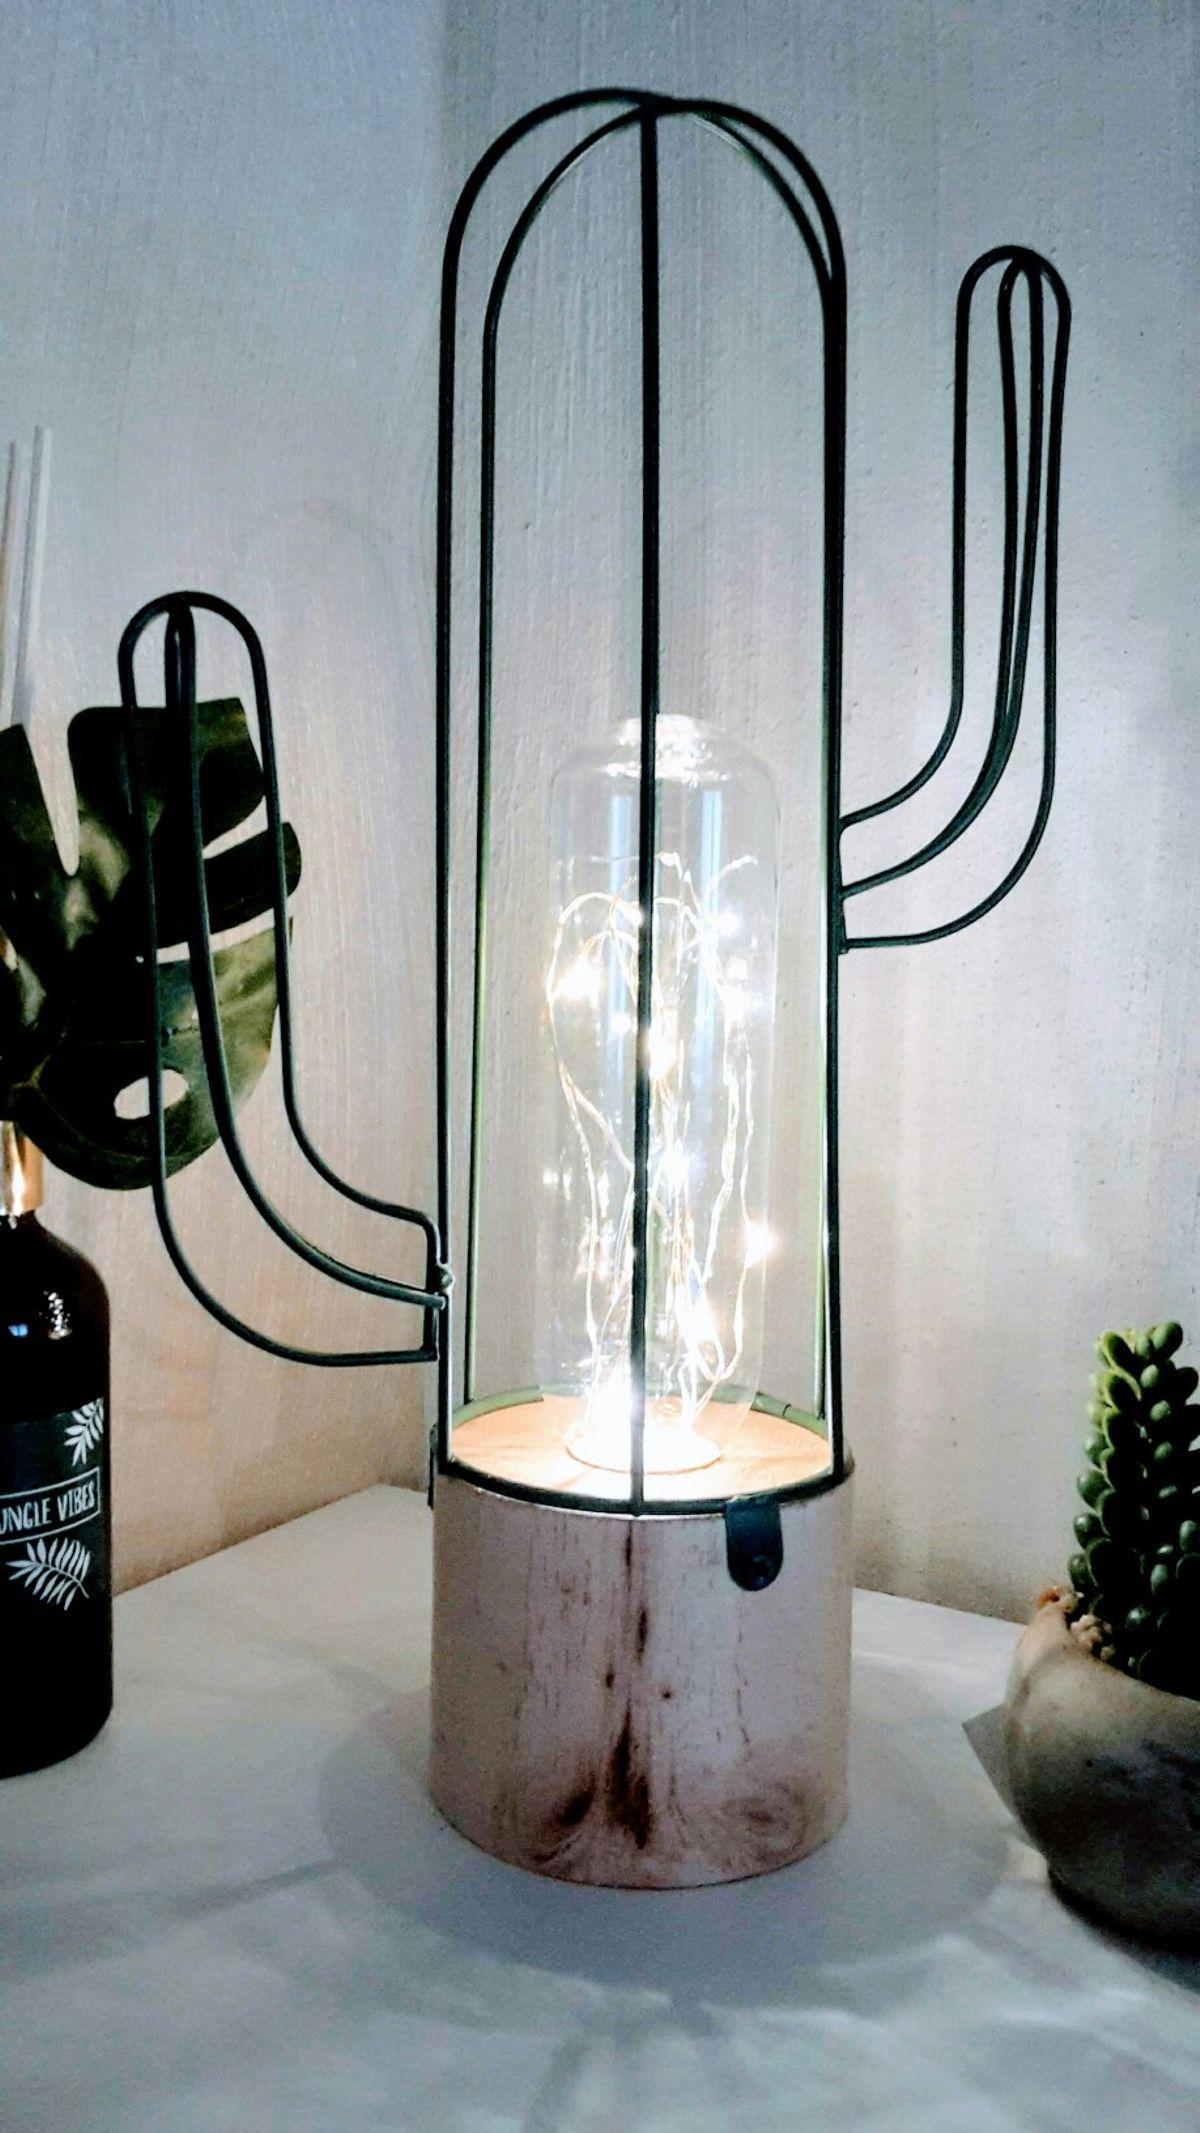 Kaktus Lampe Groß